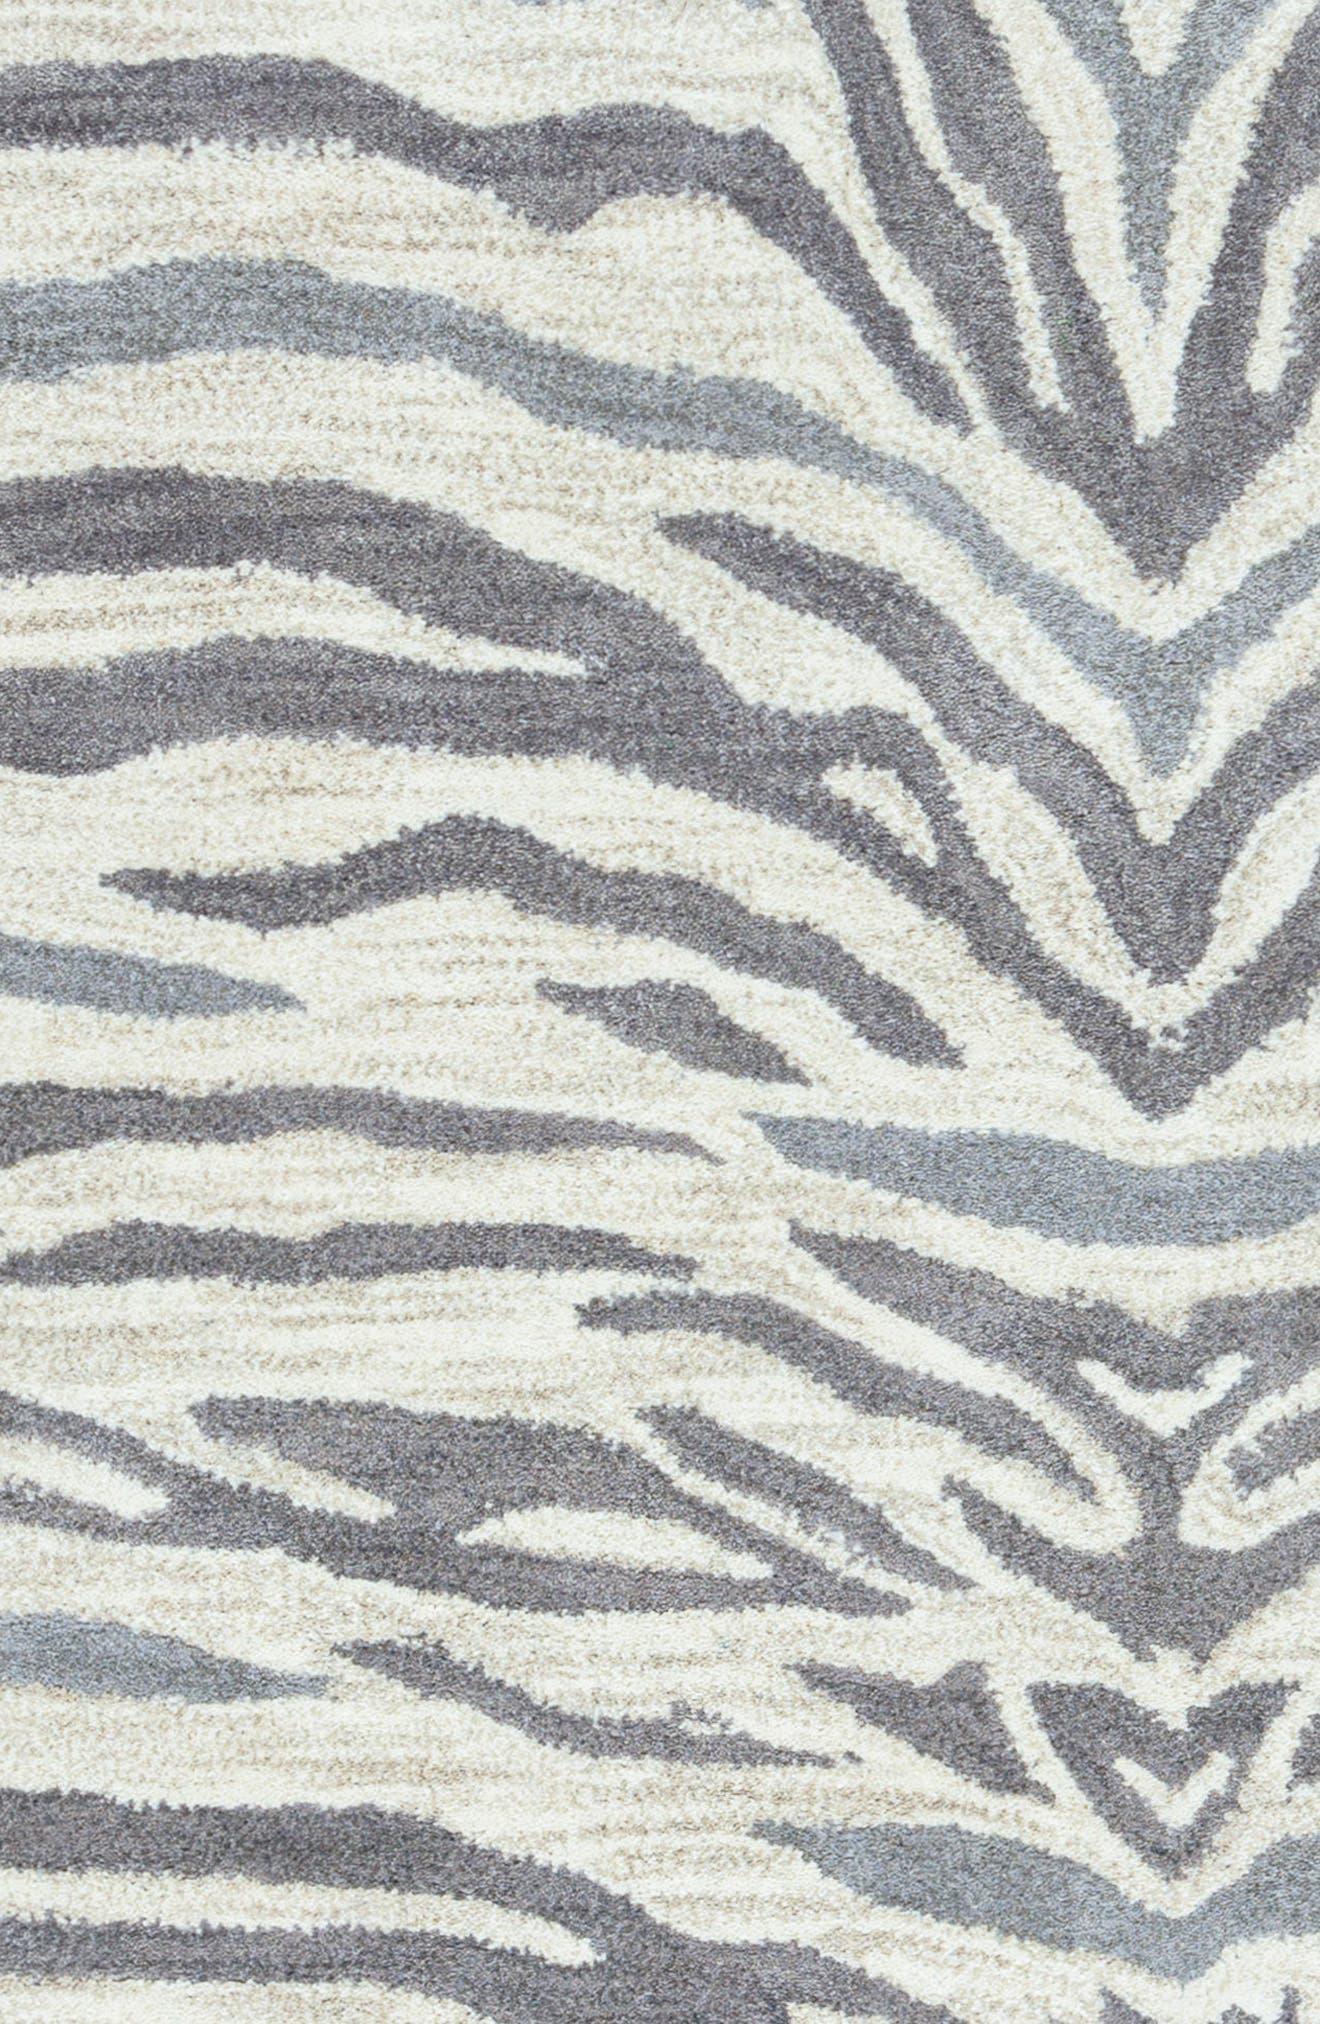 'Valintino Zebra' Hand Tufted Wool Area Rug,                             Alternate thumbnail 3, color,                             020